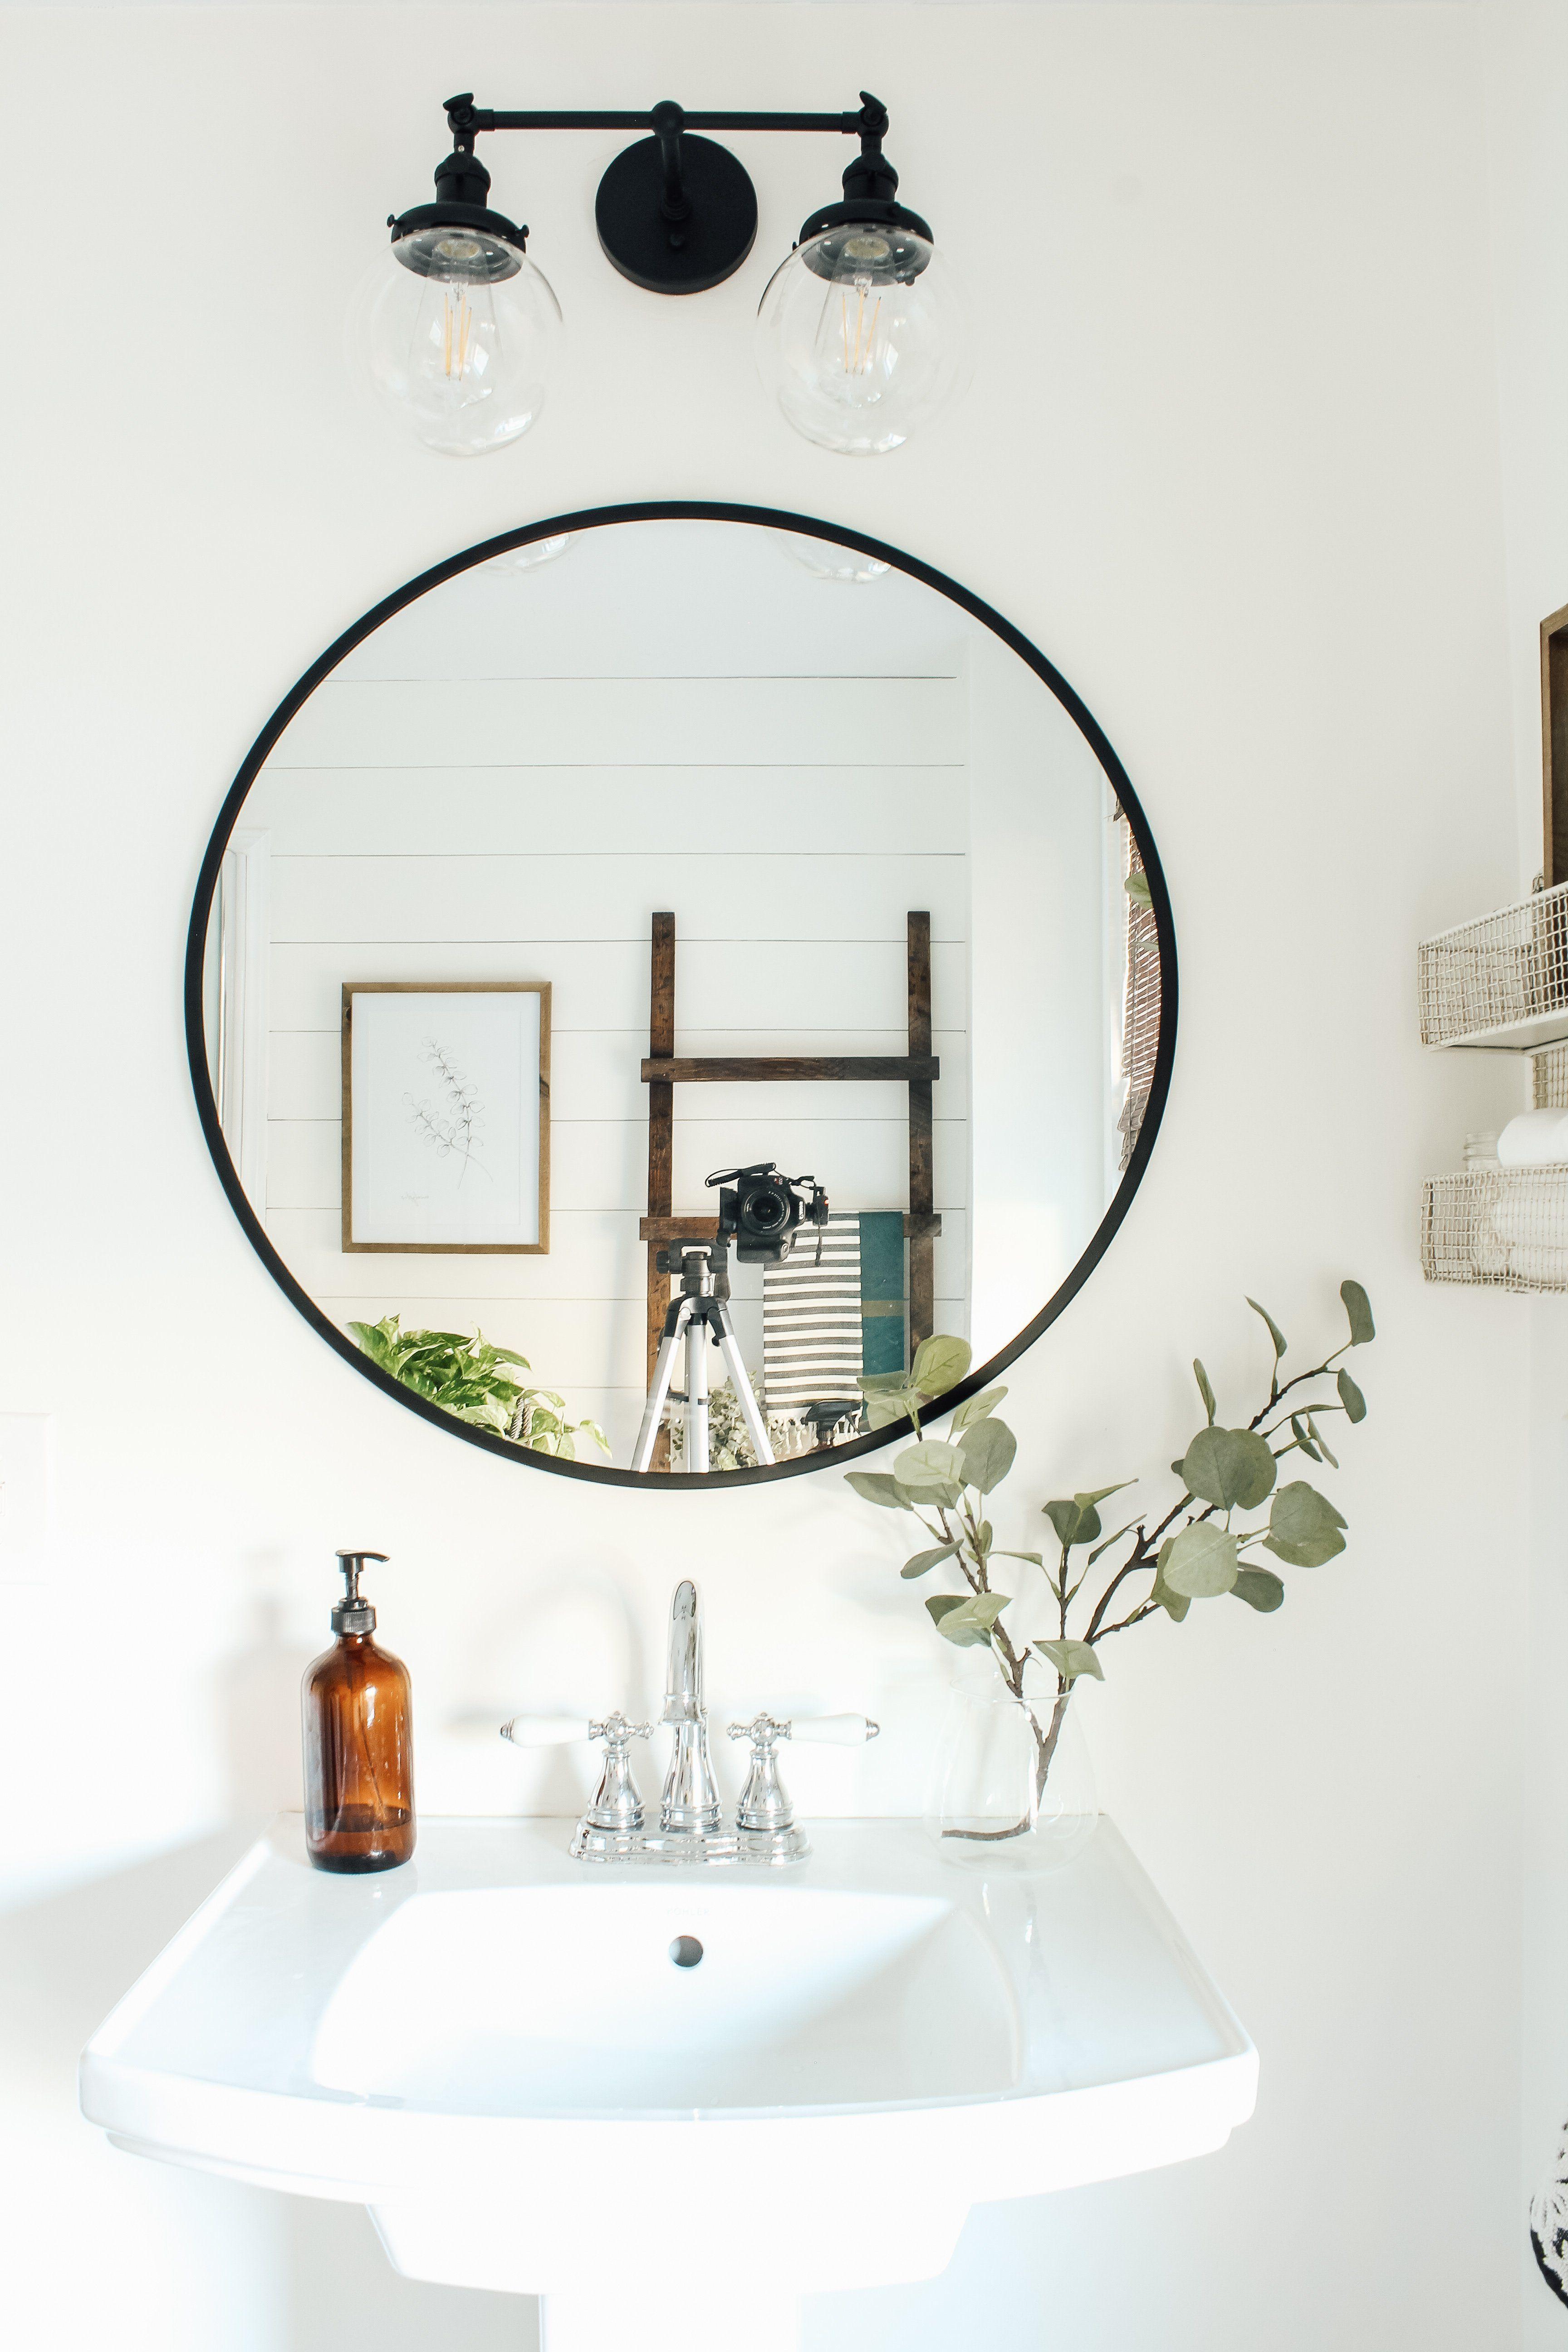 Small Bathroom Makeover Small Bathroom Makeover Round Mirror Bathroom Bathroom Makeover [ 5184 x 3456 Pixel ]